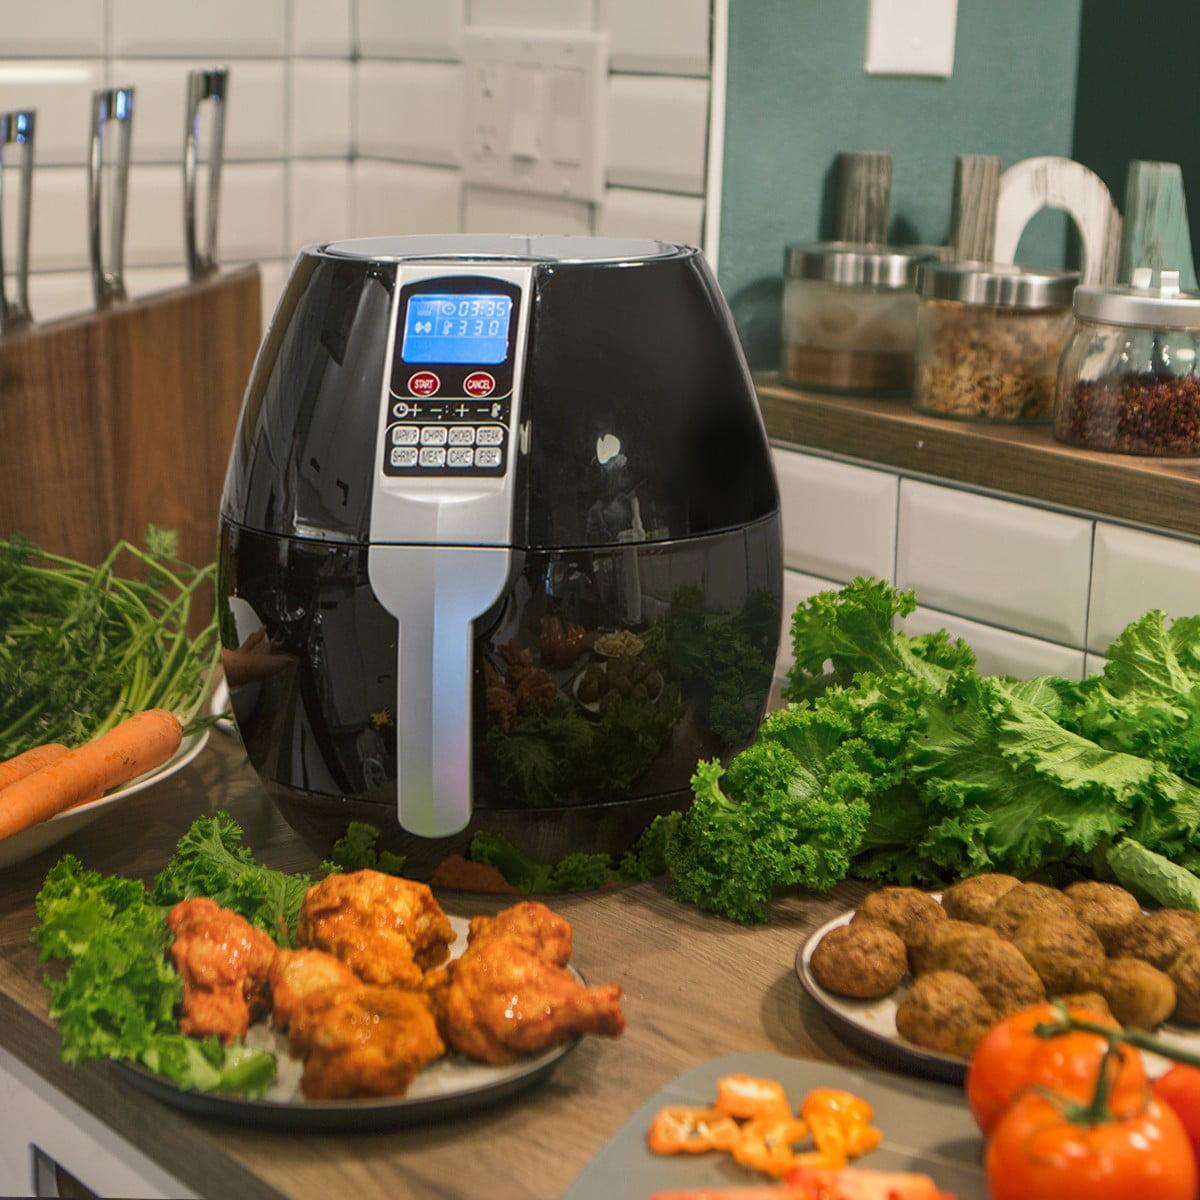 XtremepowerUS 3.7QT 1500W Electric Air Fryer Cooker 8 Cooking Menu Setting Digital Display